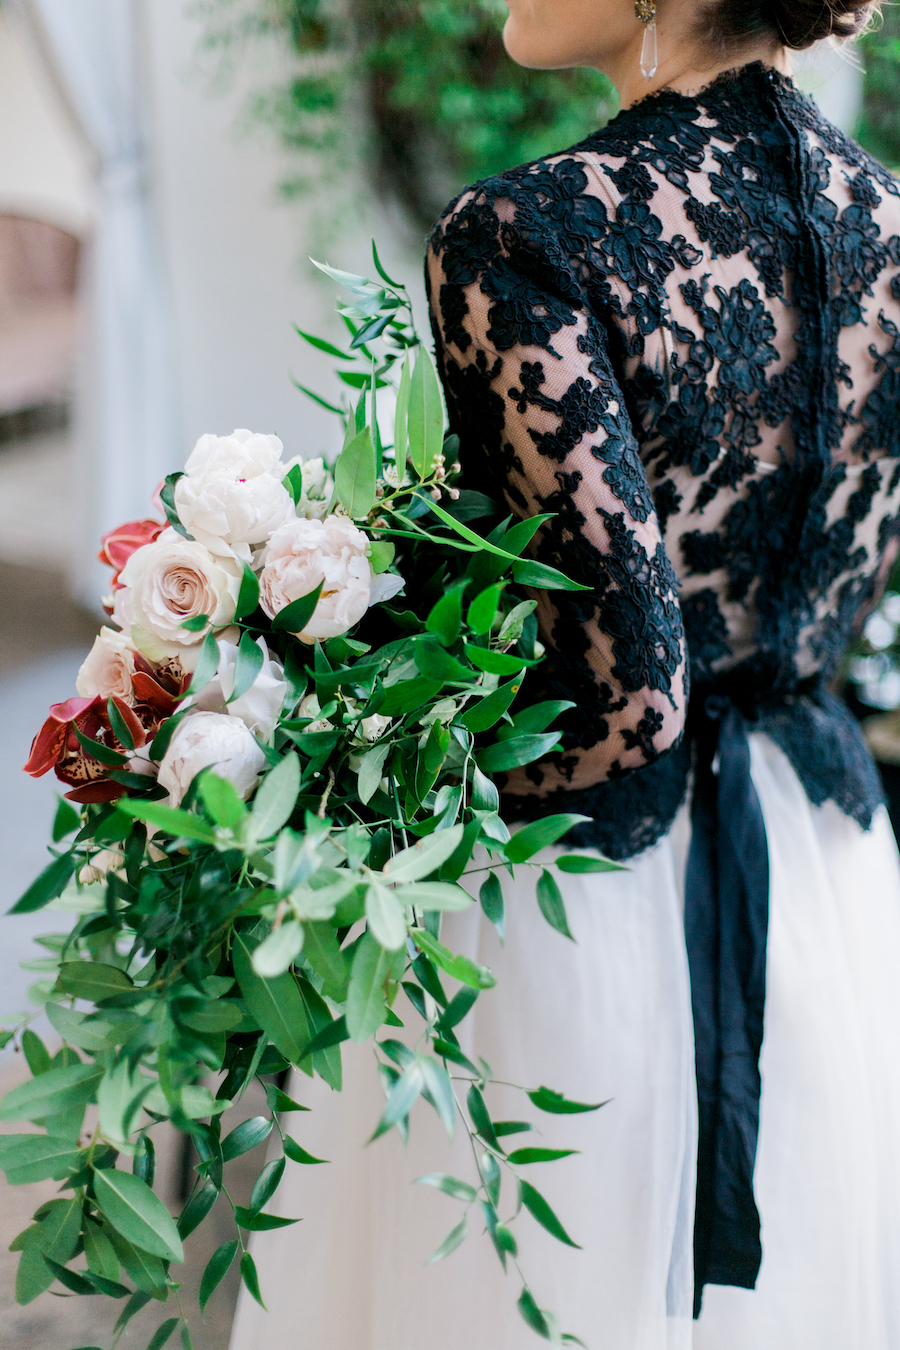 burlap-and-bordeux-steven-leyva-photography-villa-and-vine-wedding-styled-shoot2.jpg